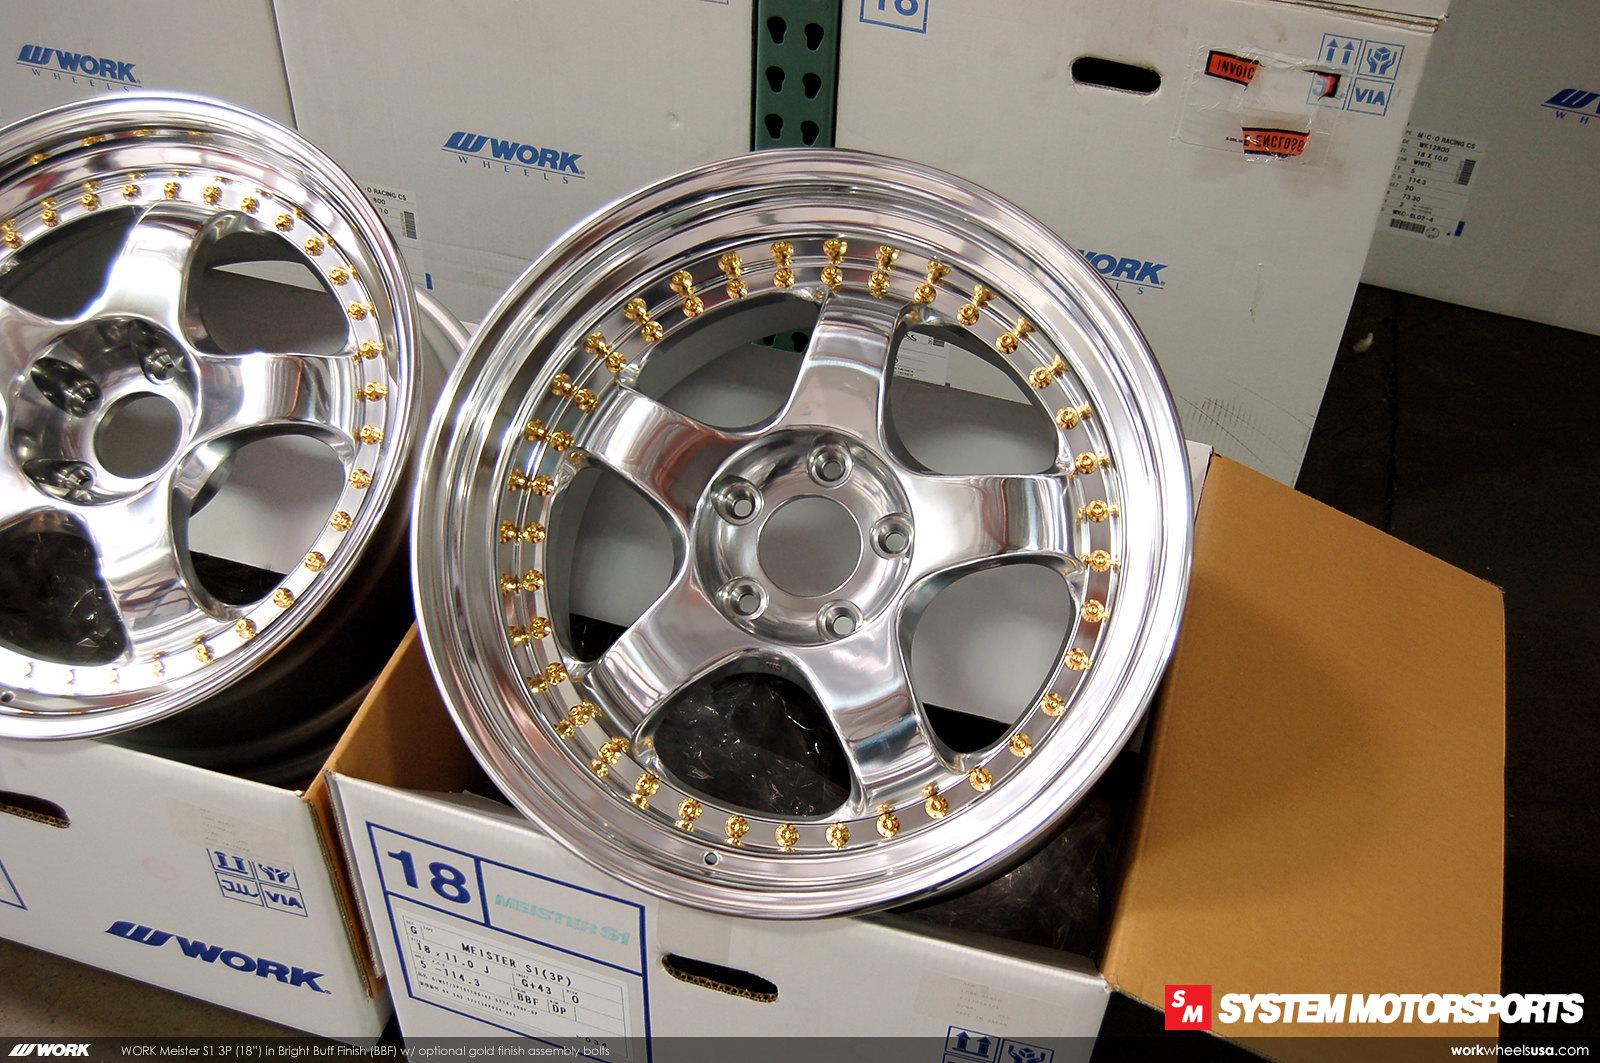 Work Meister S1 3P in Bright Buff Finish (BBF) Full Polish Custom Face Finish + Gold Hardware